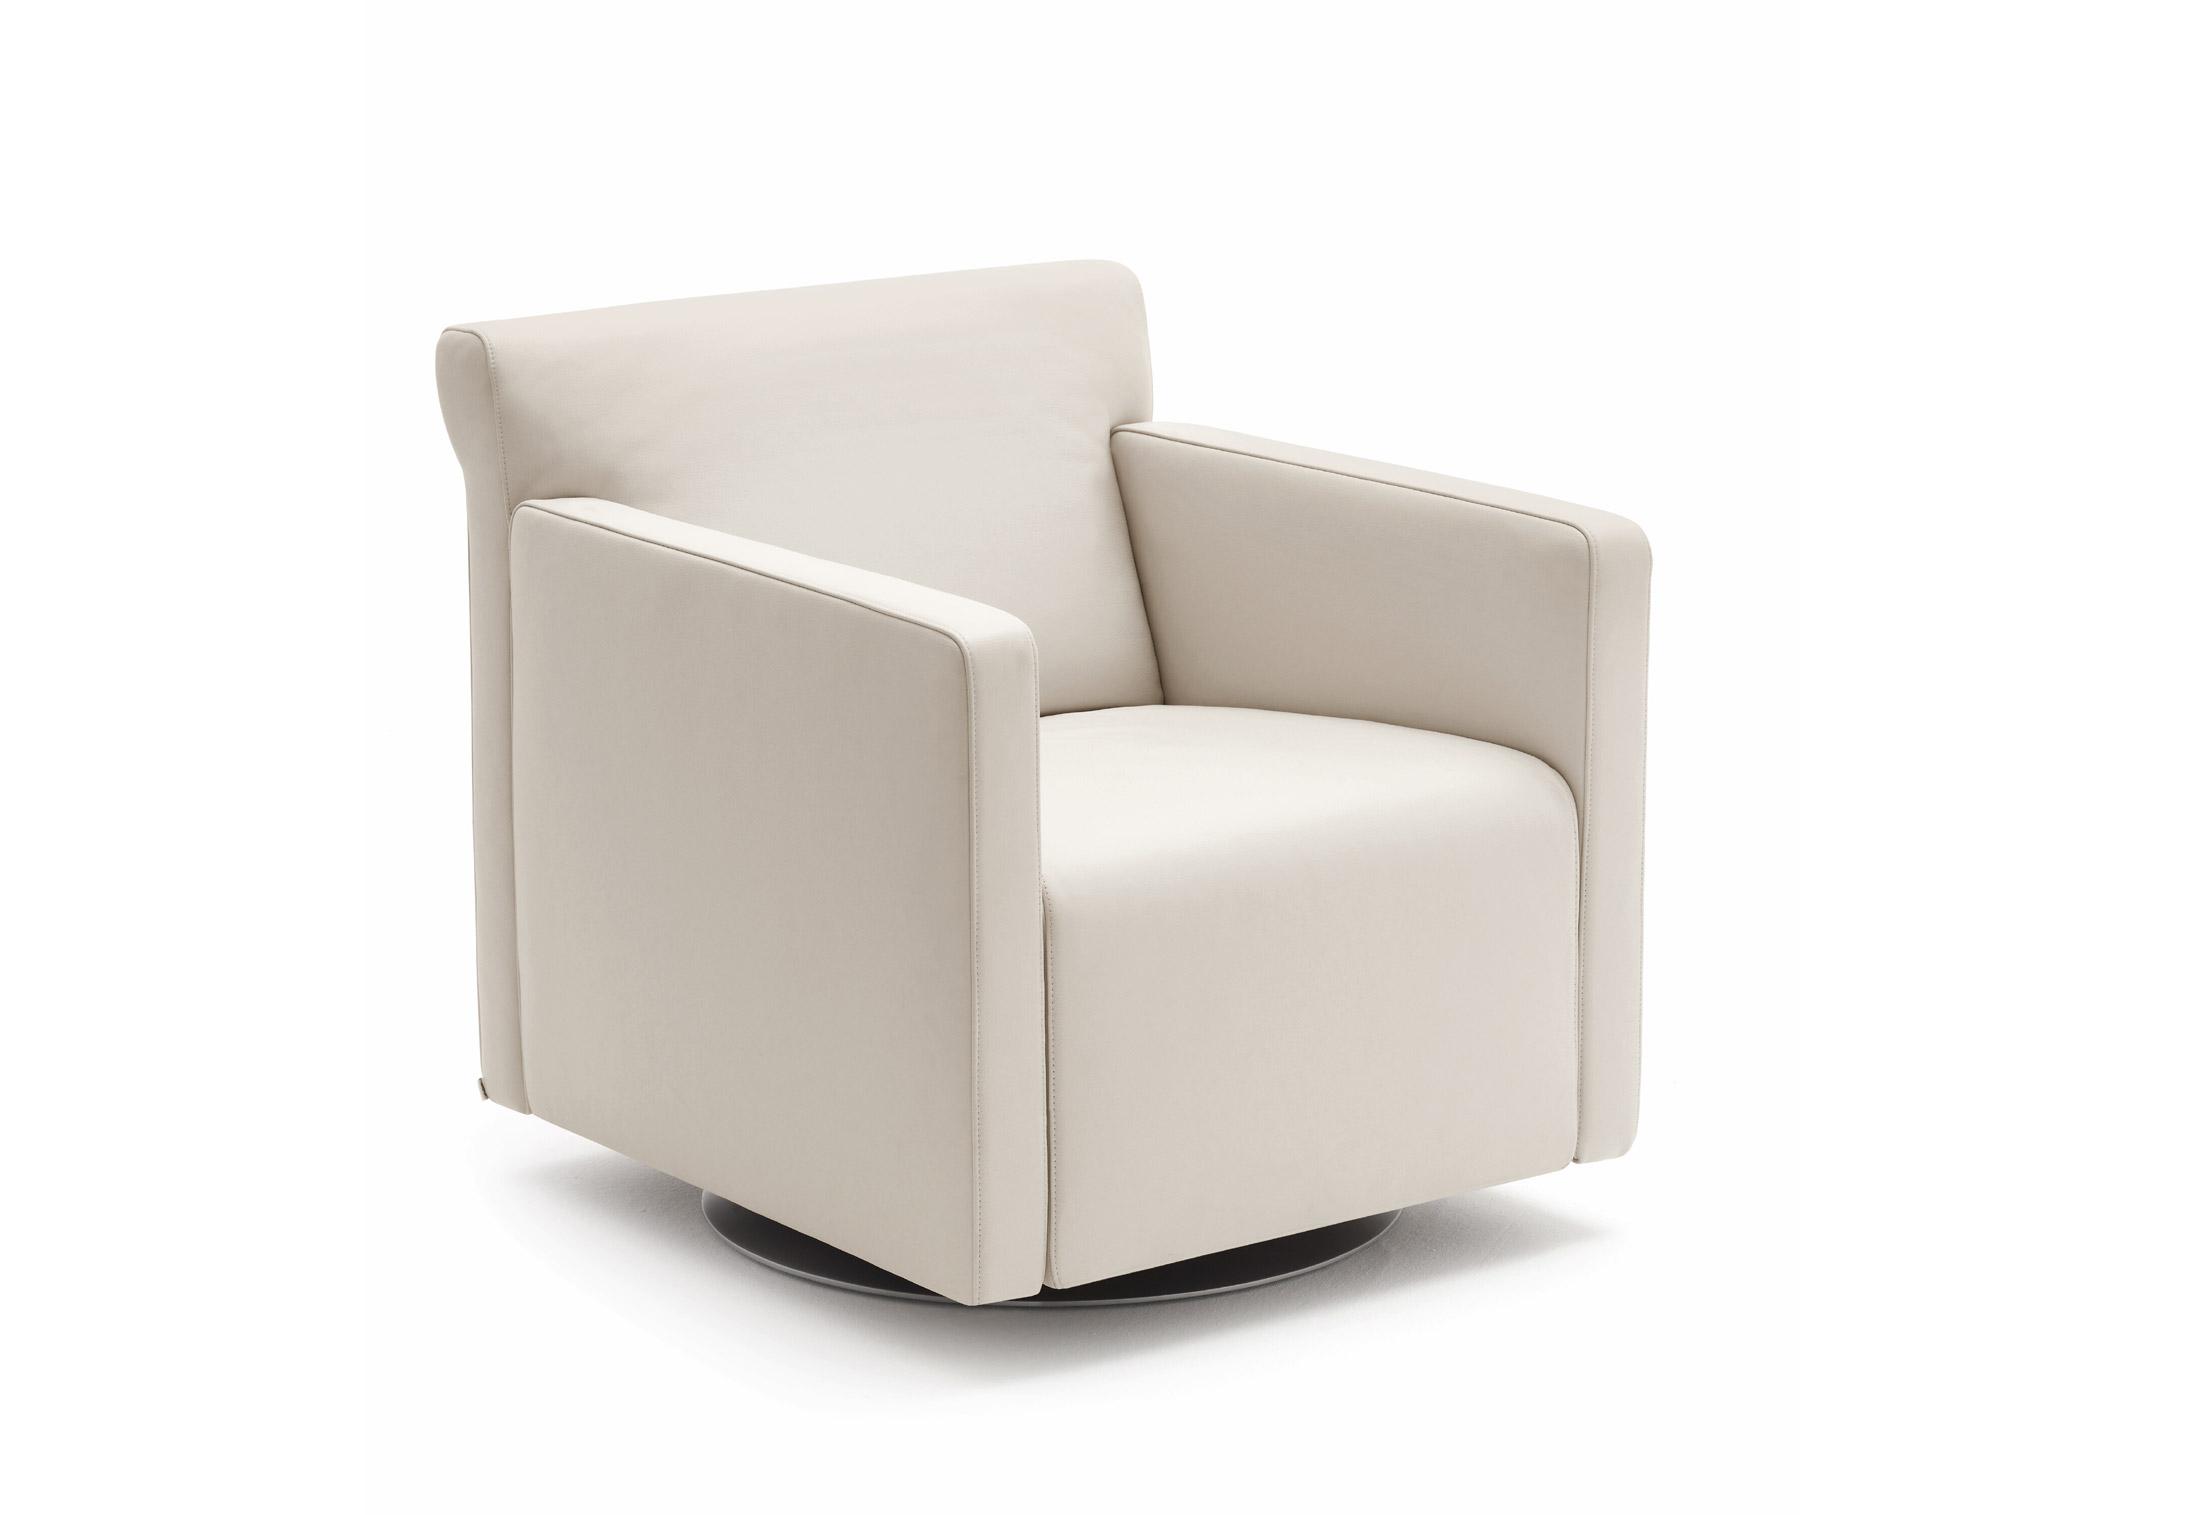 quant lounge sessel von cor stylepark. Black Bedroom Furniture Sets. Home Design Ideas